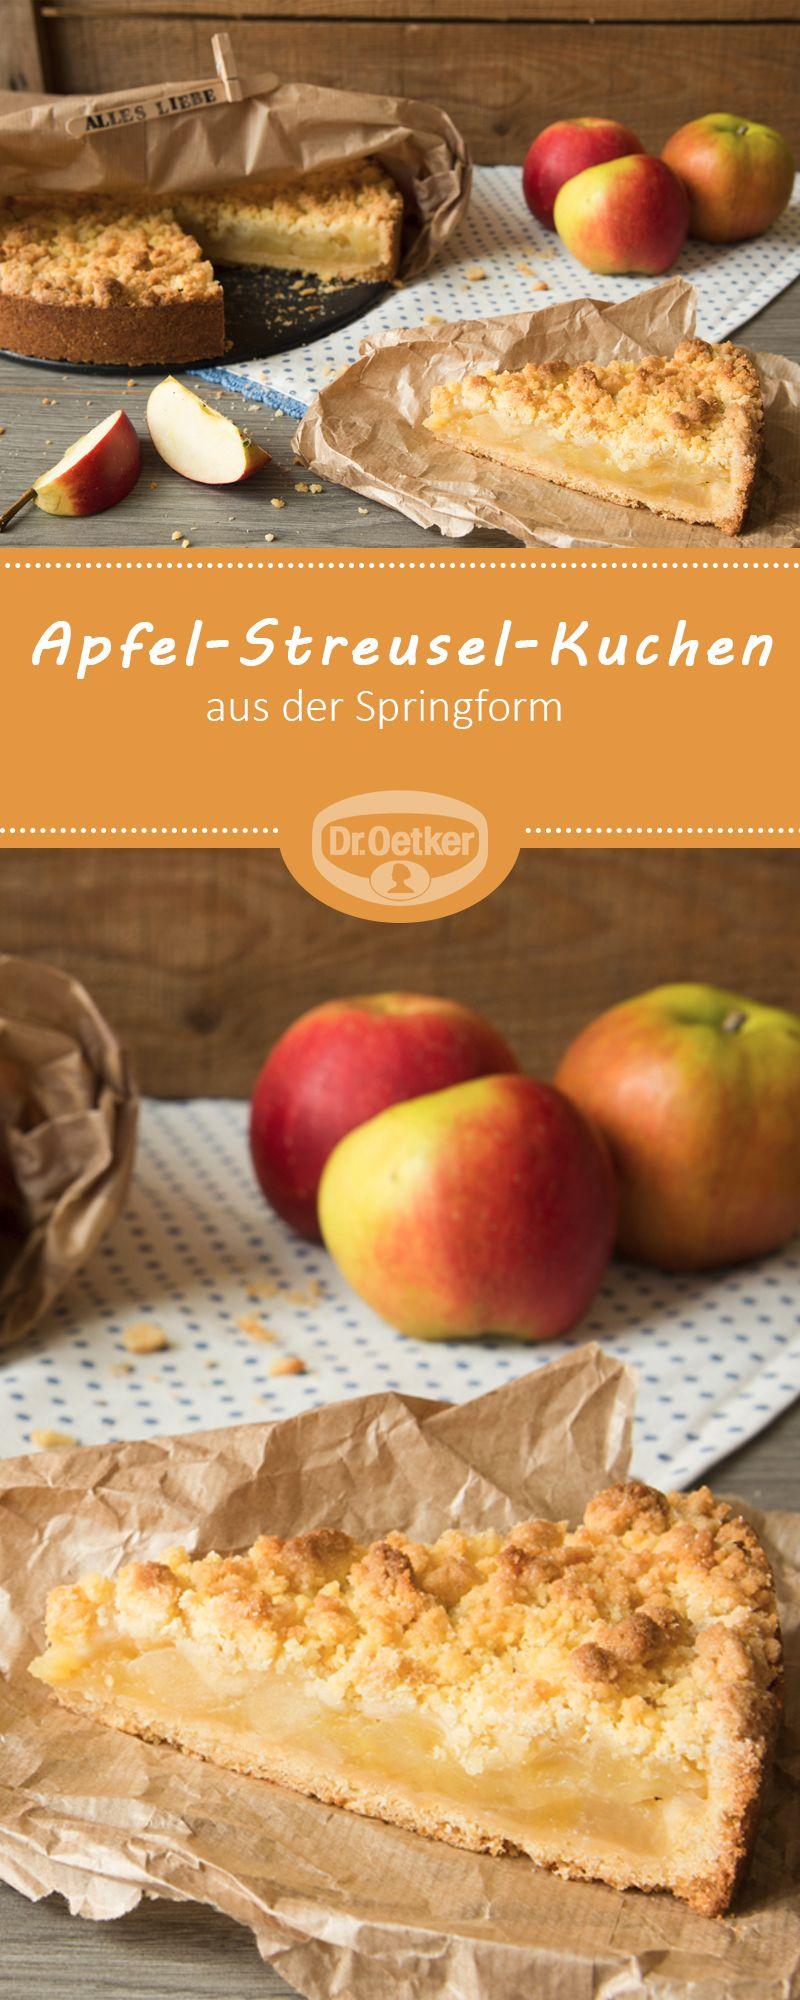 Apfel Streusel Kuchen Aus Der Springform Rezept Backen